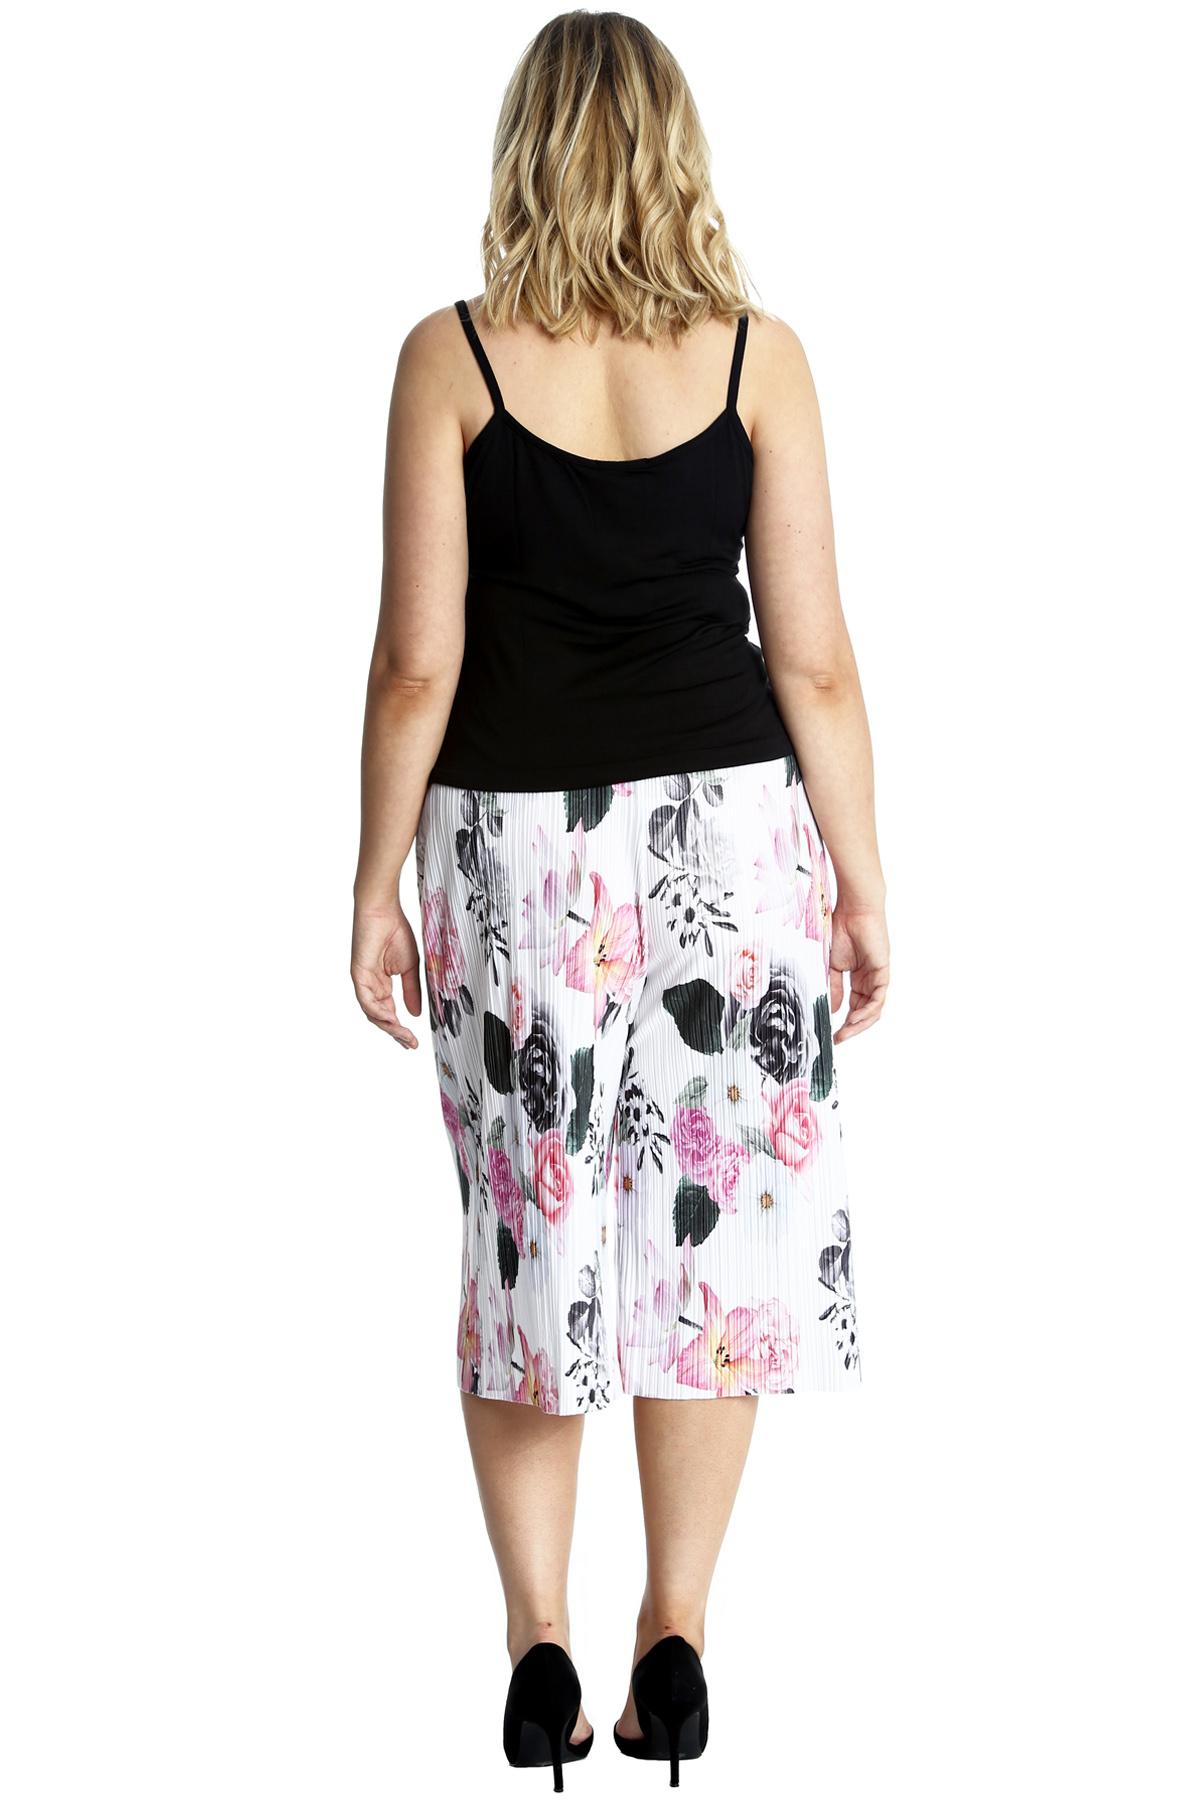 New Womens Plus Size Culottes Ladies Short Floral Print Crinkle Knee Nouvelle